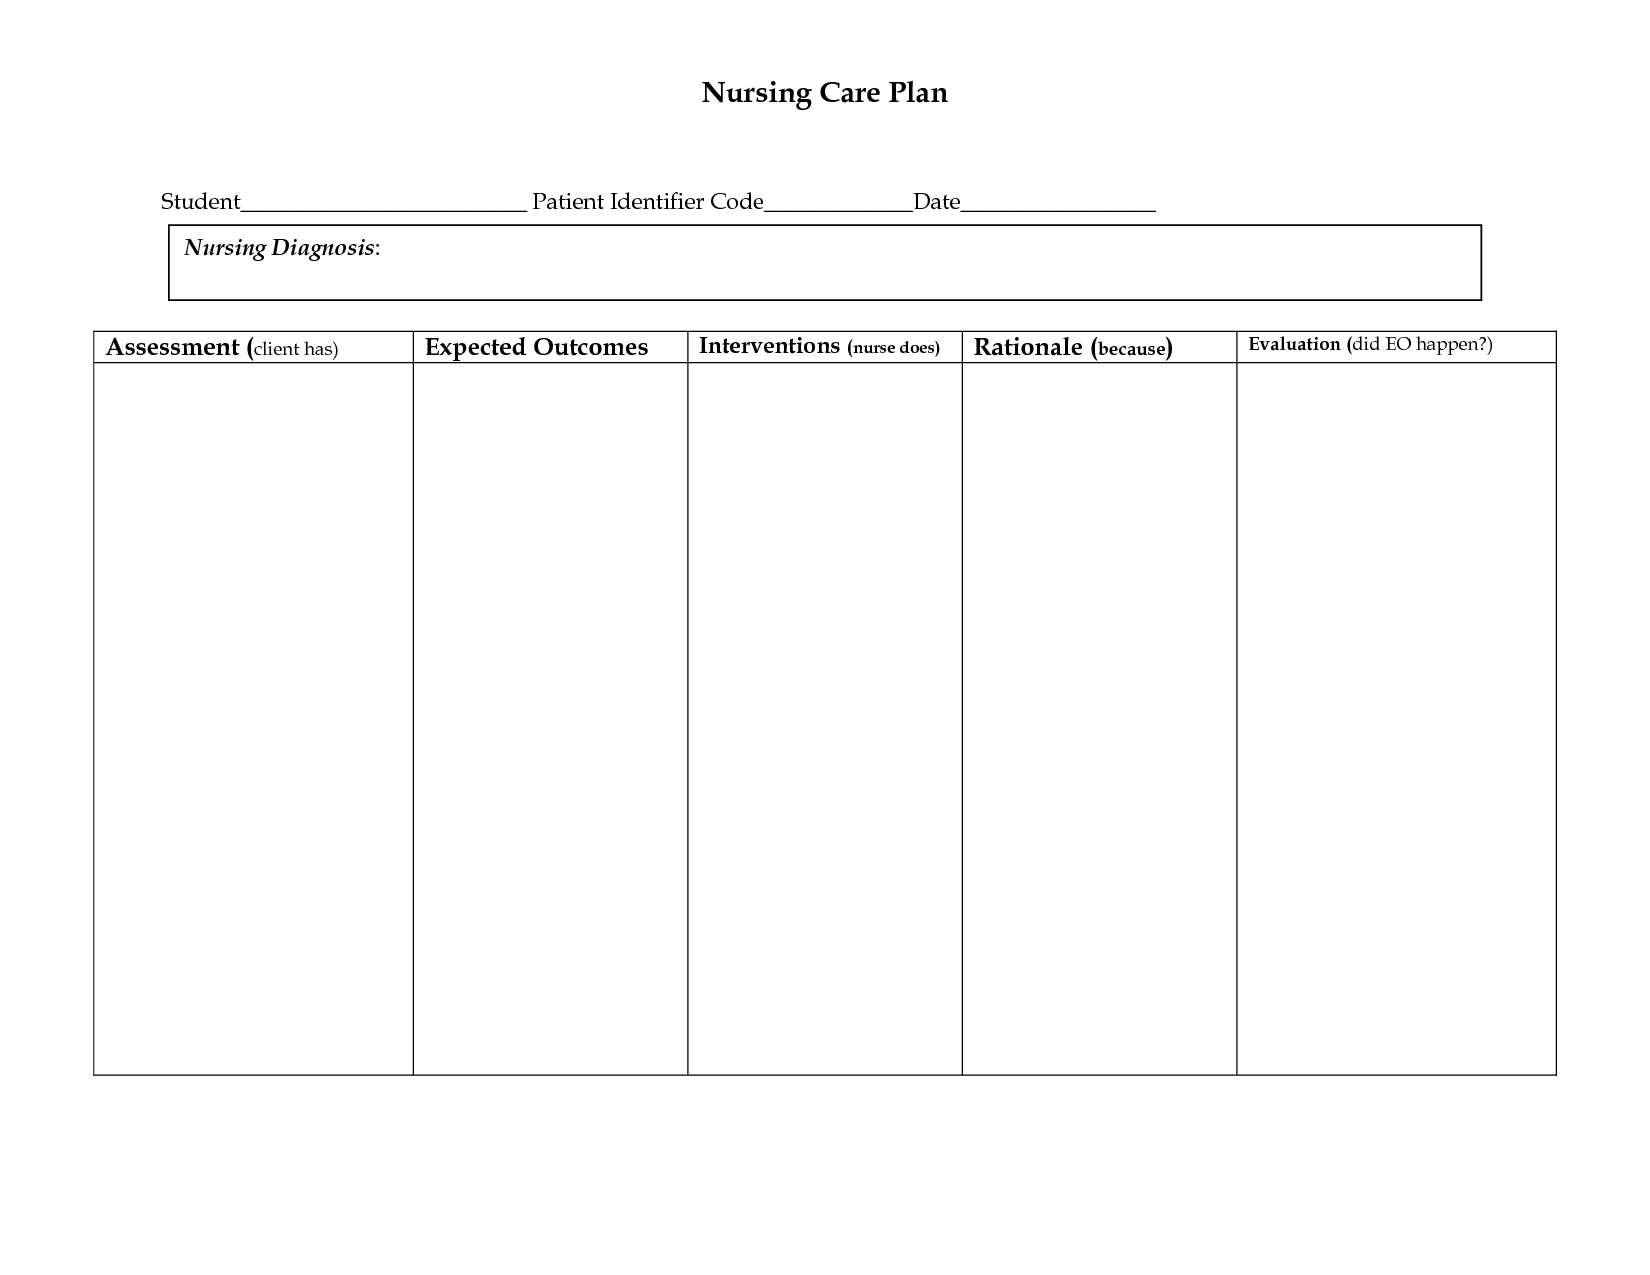 Nursing Care Plans Template Free Plan Templates Business For Pertaining To Nursing Care Plan Templates Blank